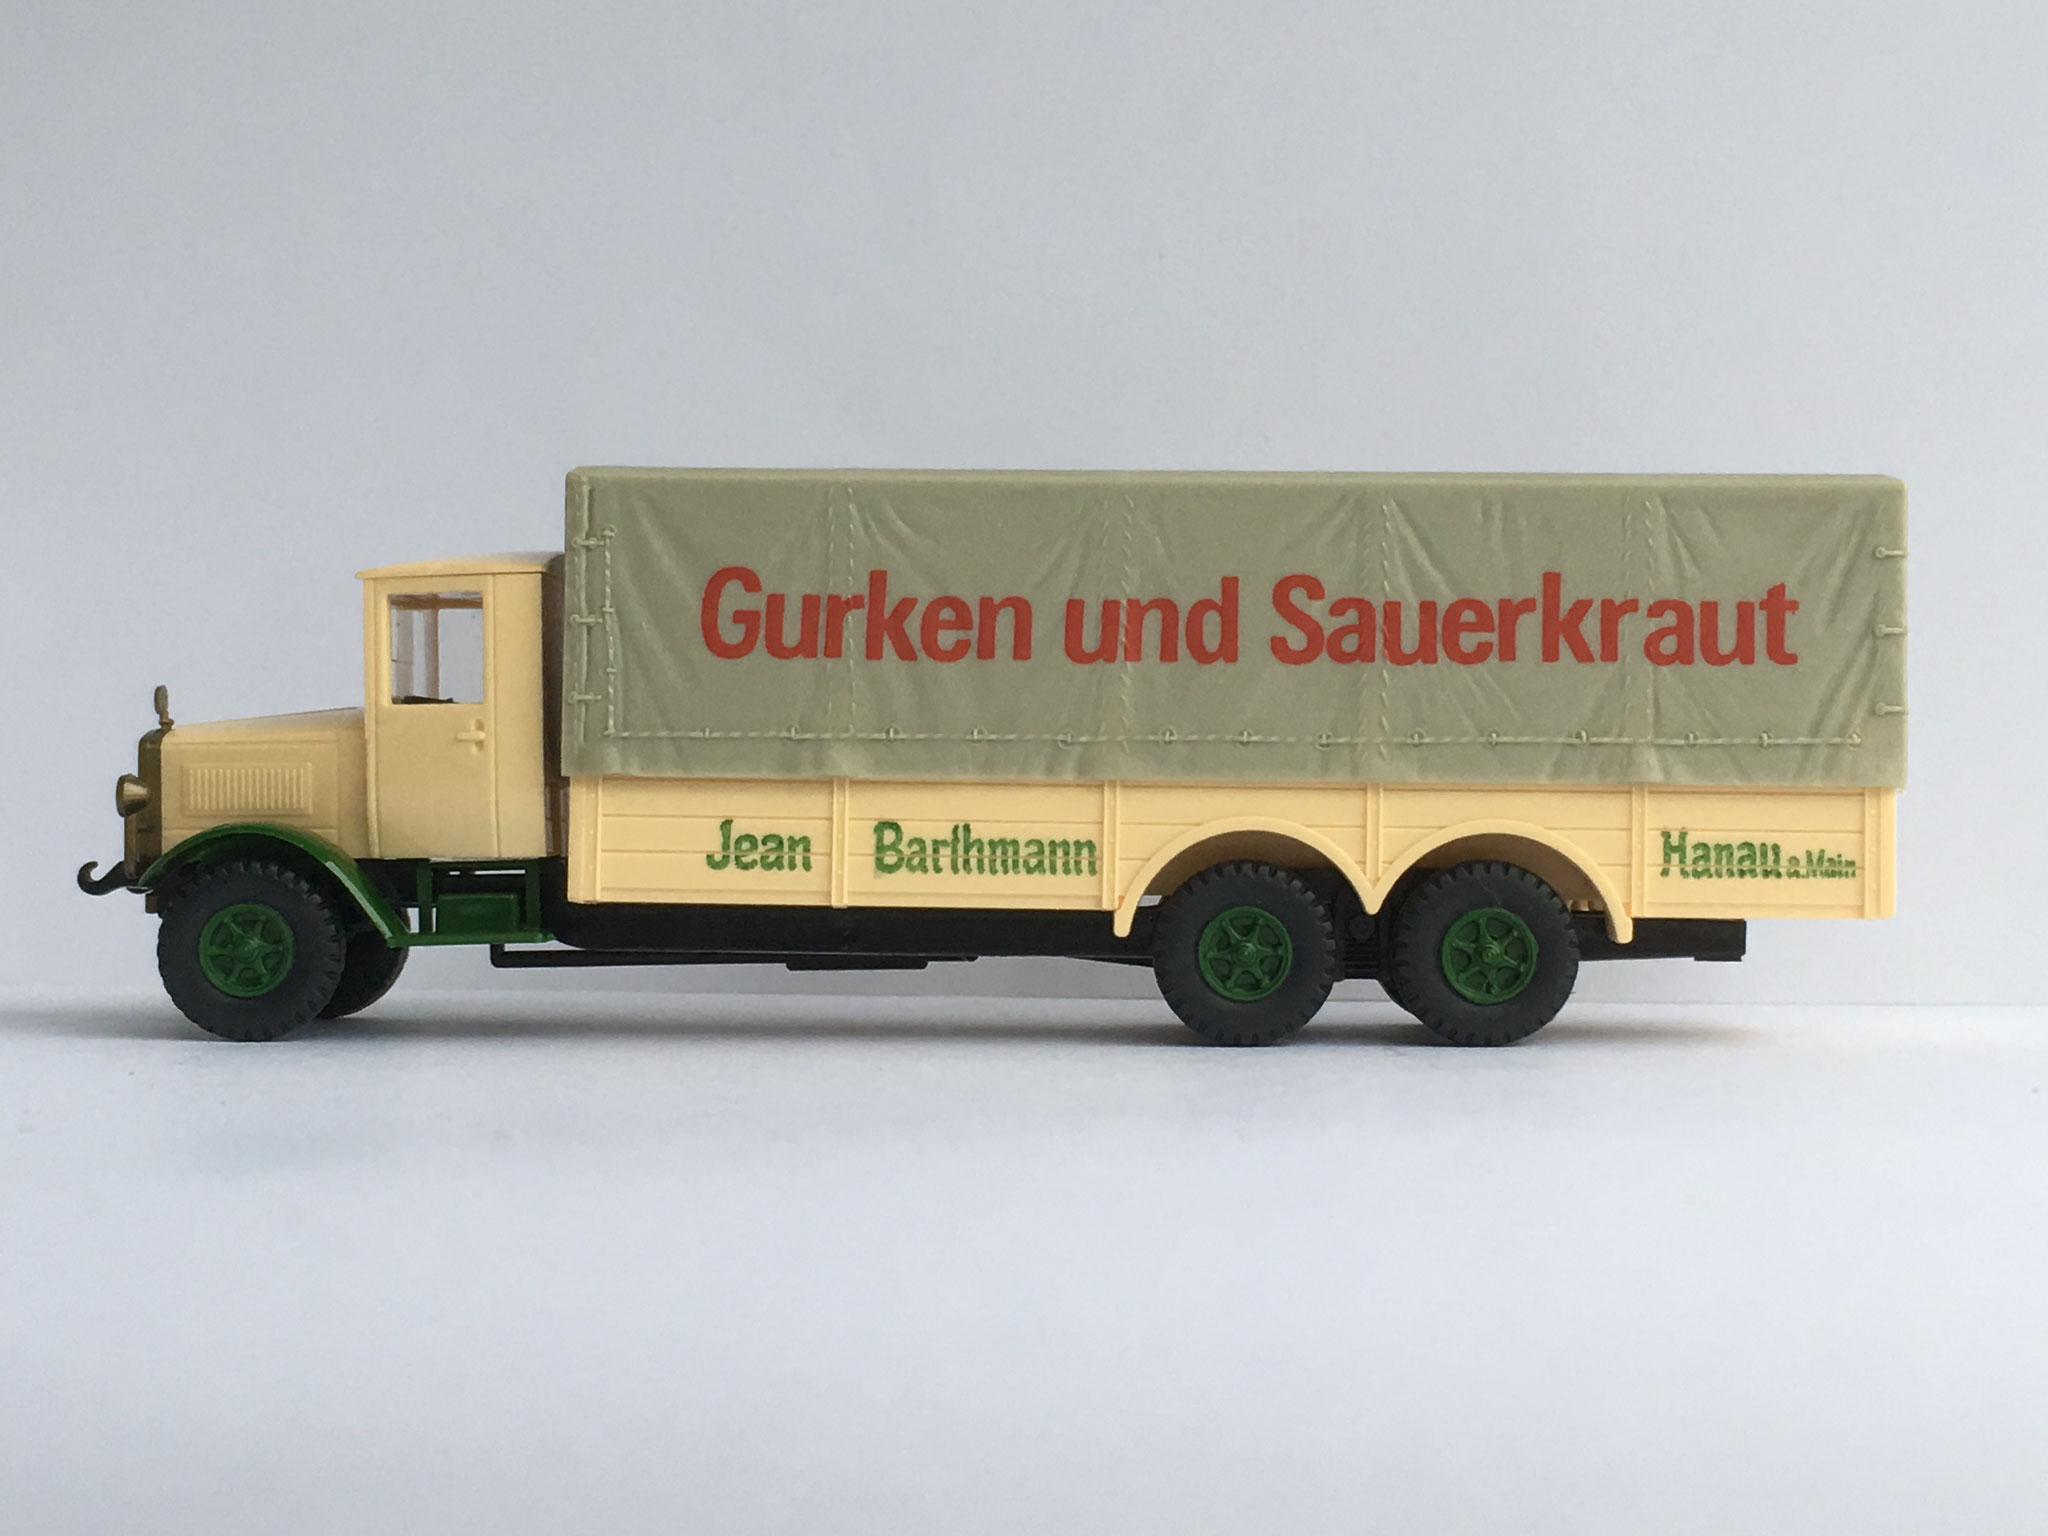 Mercedes N56 Sauerkrautfabrik Barthmann, Art. Nr. 1015 (ab 1988 im Programm)